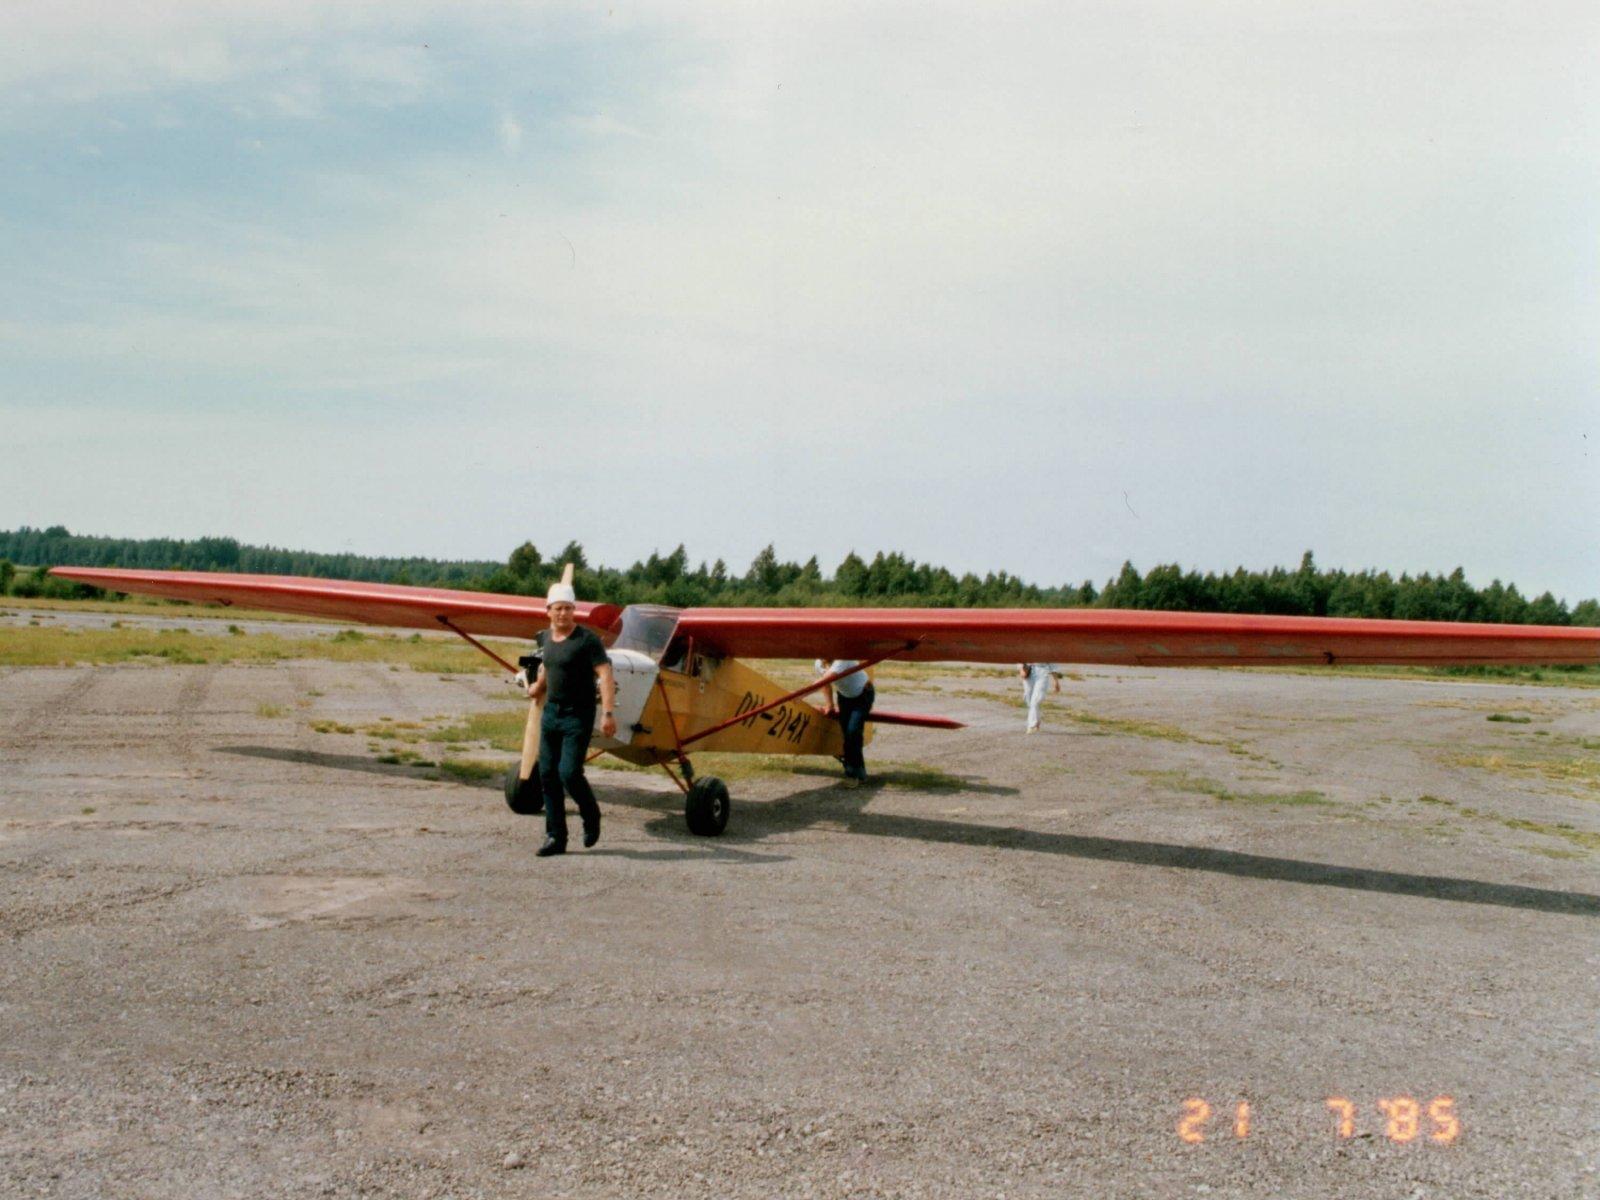 Schleicher Ka-4 Rhönlerche II / Moottori-Lerche OH-214X EFHN 1985-07-21